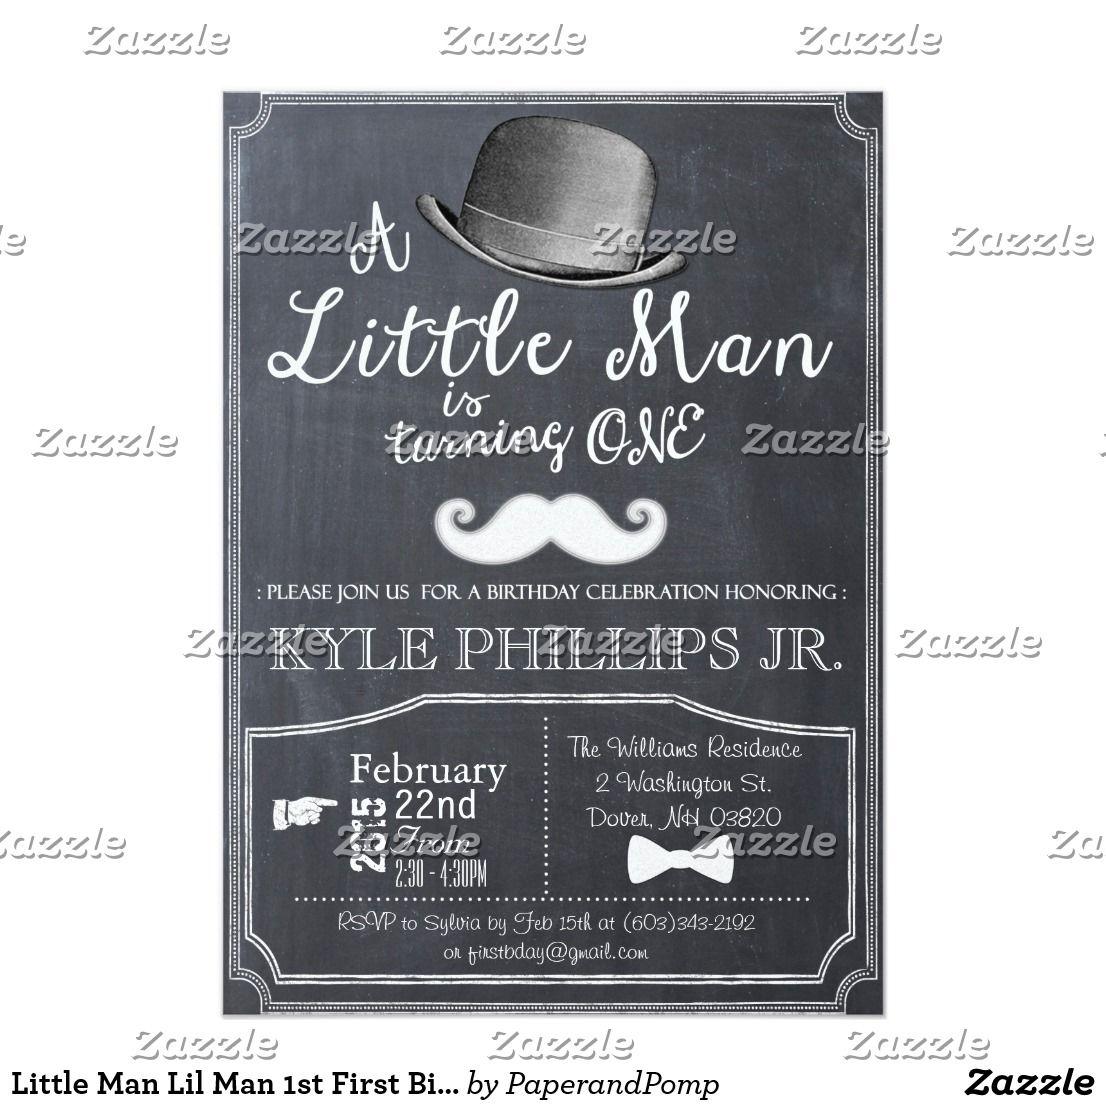 Little Man Lil Man 1st First Birthday Invitation Zazzle Com Lil Man Baby Shower Invitations First Birthday Invitations Little Man Birthday